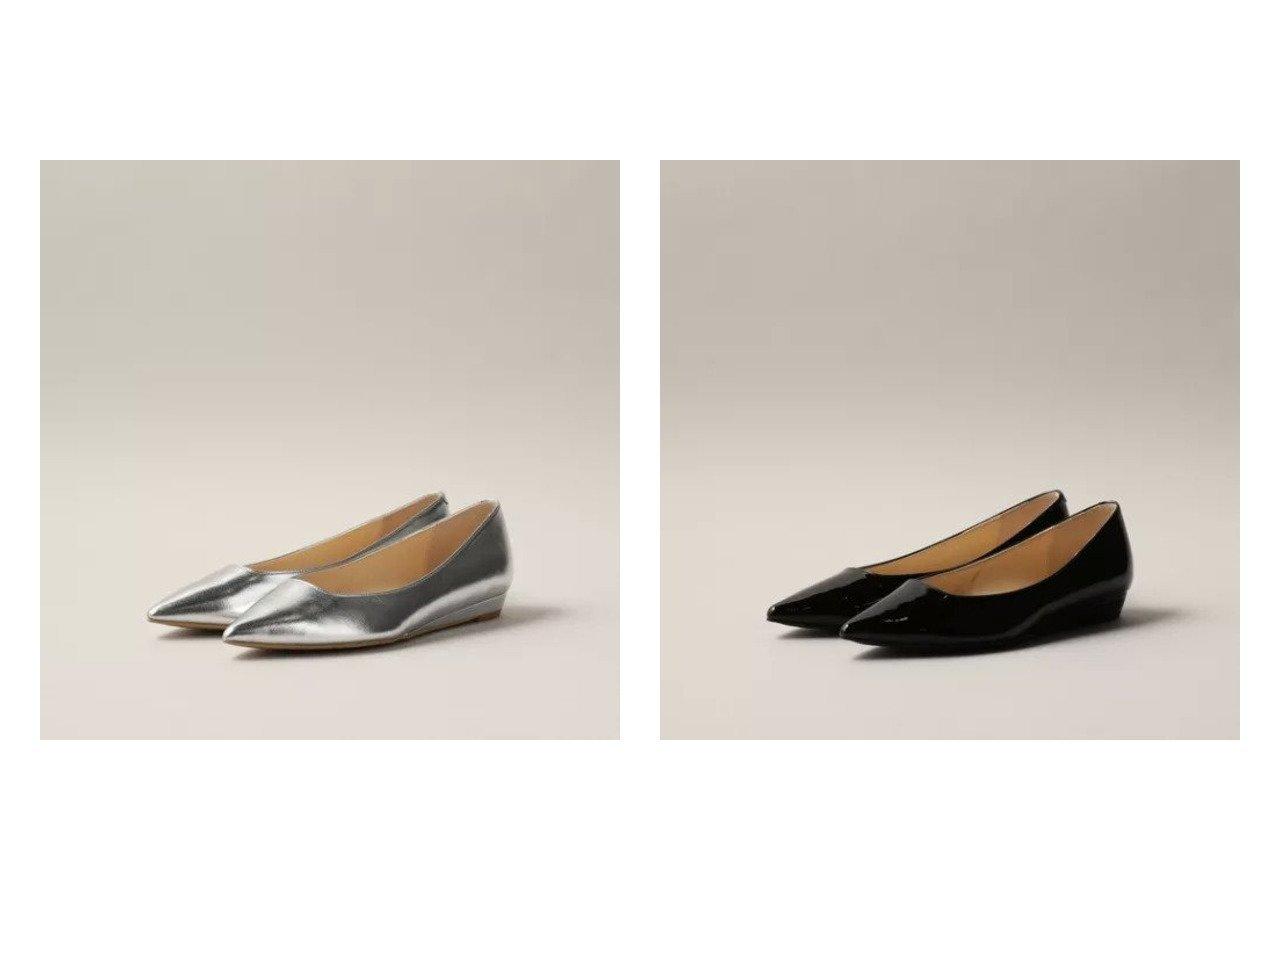 【Odette e Odile/オデット エ オディール】の【晴雨兼用】OFD R ポインテッドウェッジ パンプス20◎↓↑ 【シューズ・靴】おすすめ!人気、トレンド・レディースファッションの通販 おすすめで人気の流行・トレンド、ファッションの通販商品 インテリア・家具・メンズファッション・キッズファッション・レディースファッション・服の通販 founy(ファニー) https://founy.com/ ファッション Fashion レディースファッション WOMEN 抗菌 シューズ |ID:crp329100000045542